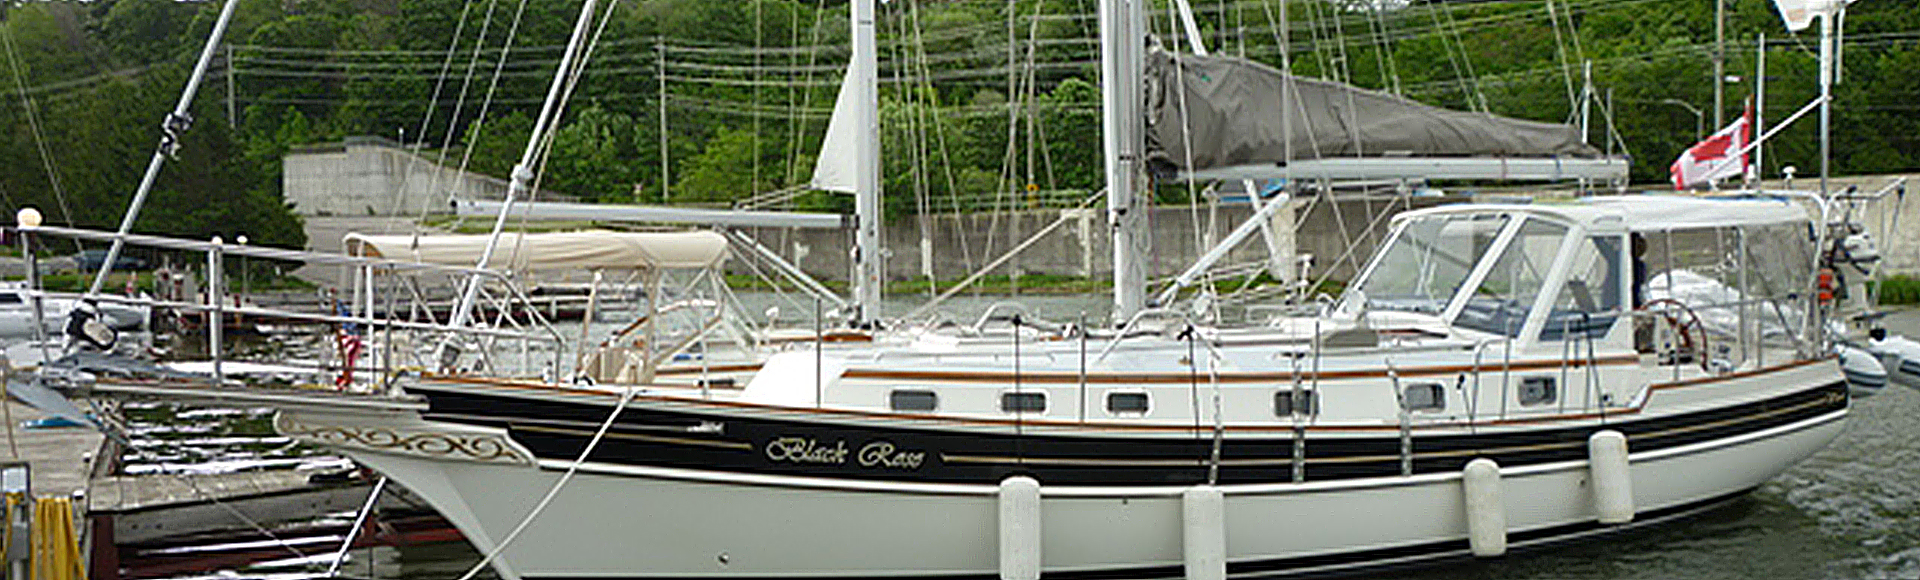 "SALE PENDING WINTER 2020 – 2002 Gozzard 41A Hull #3 ""Black Rose"""